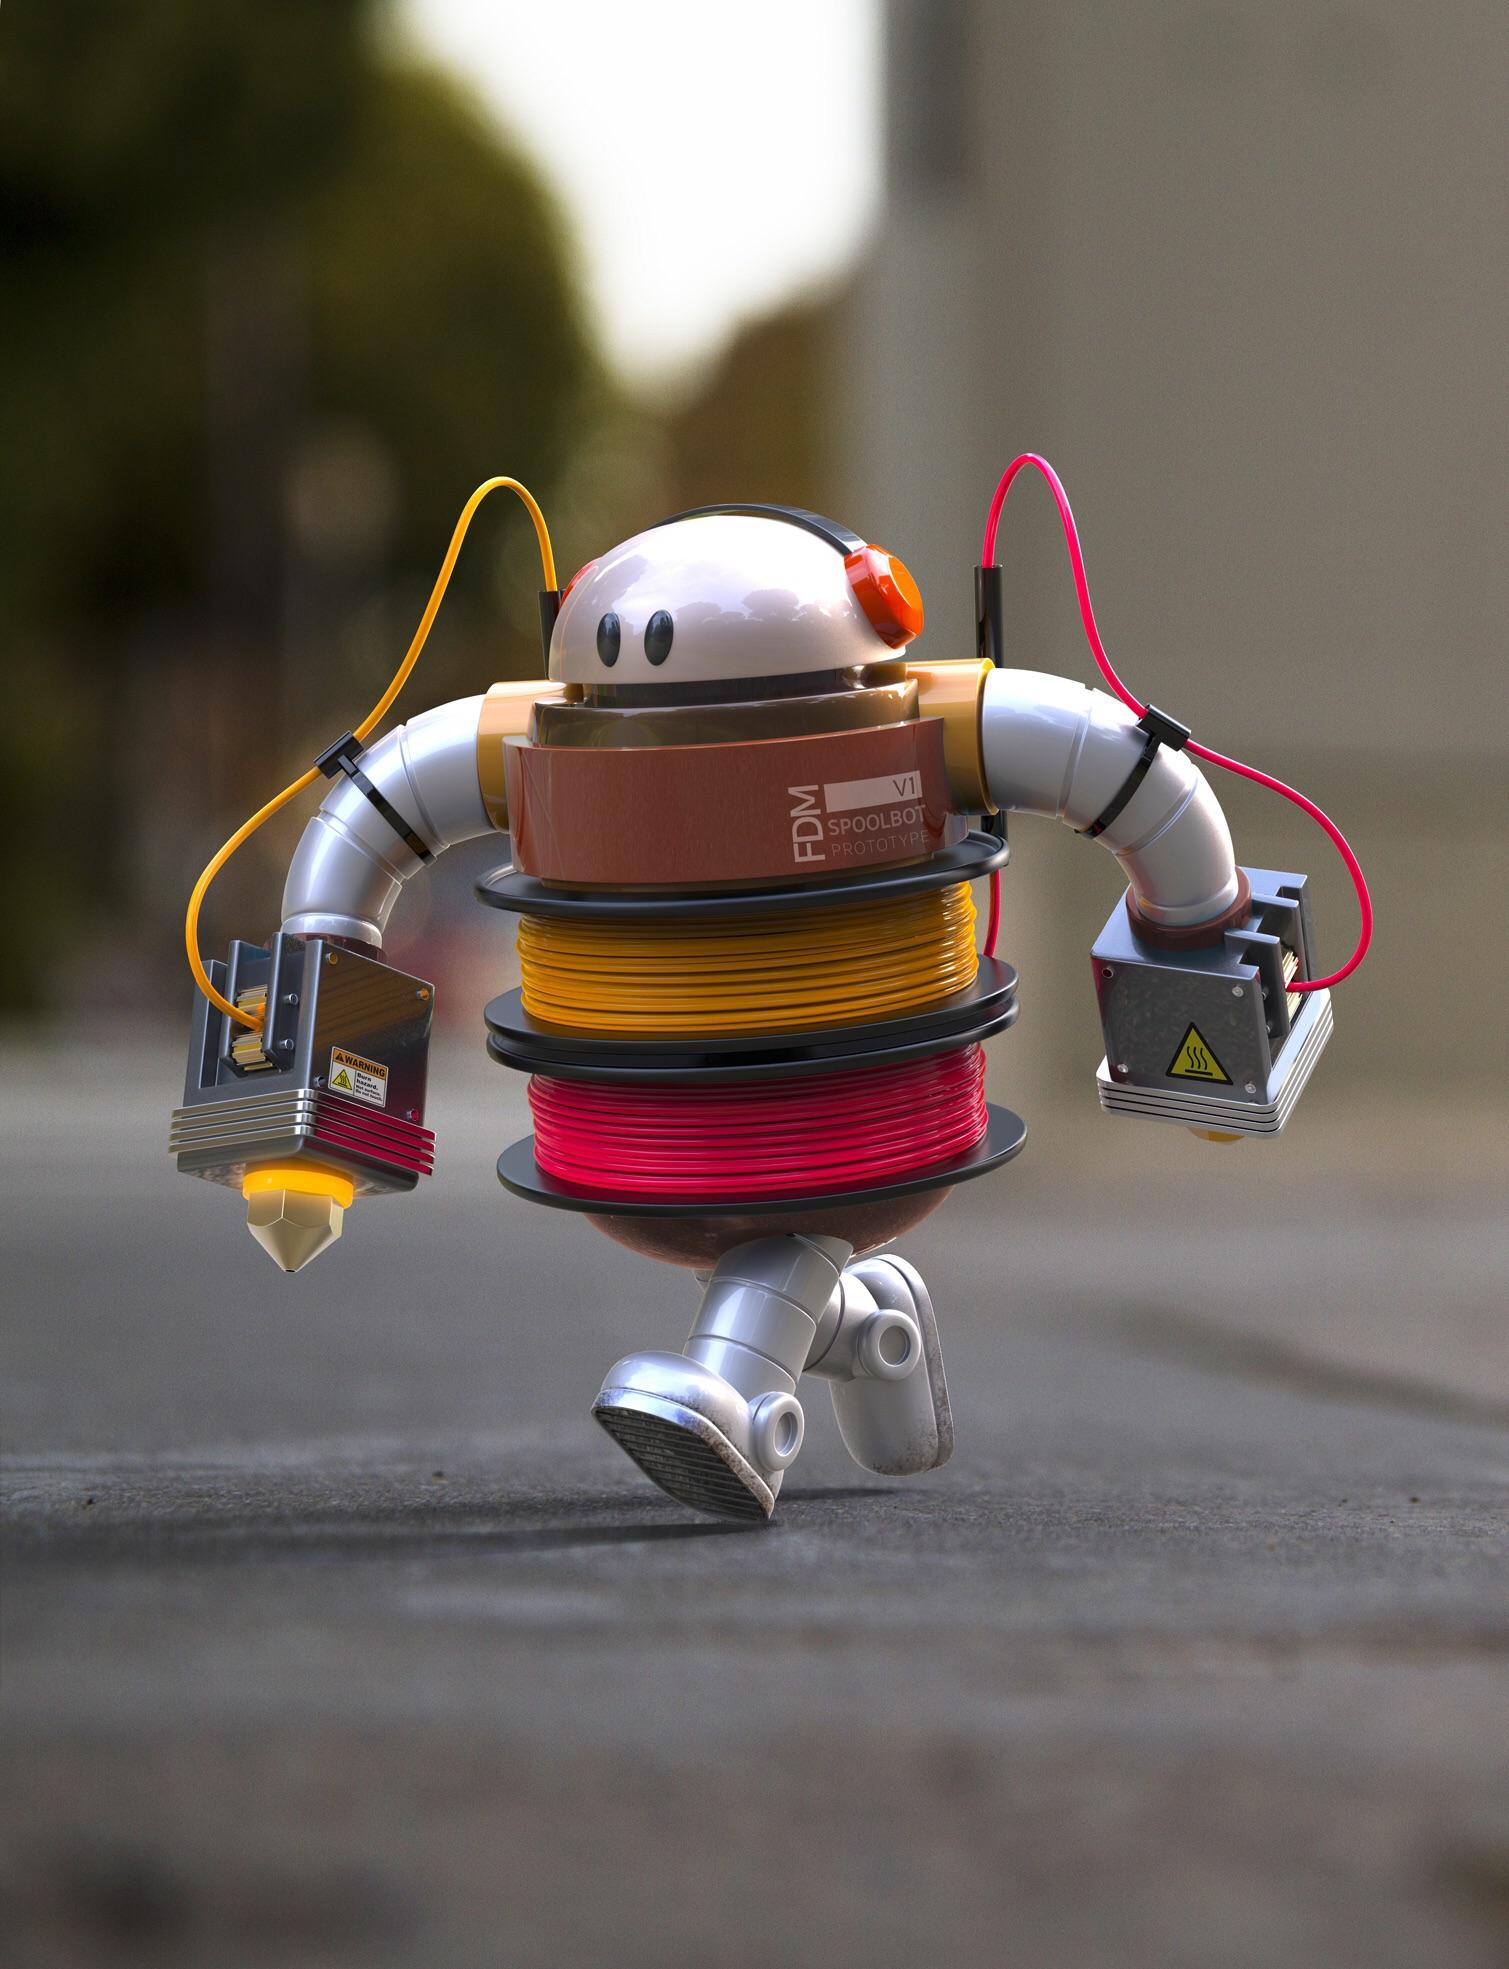 SpoolBot Prototype V1